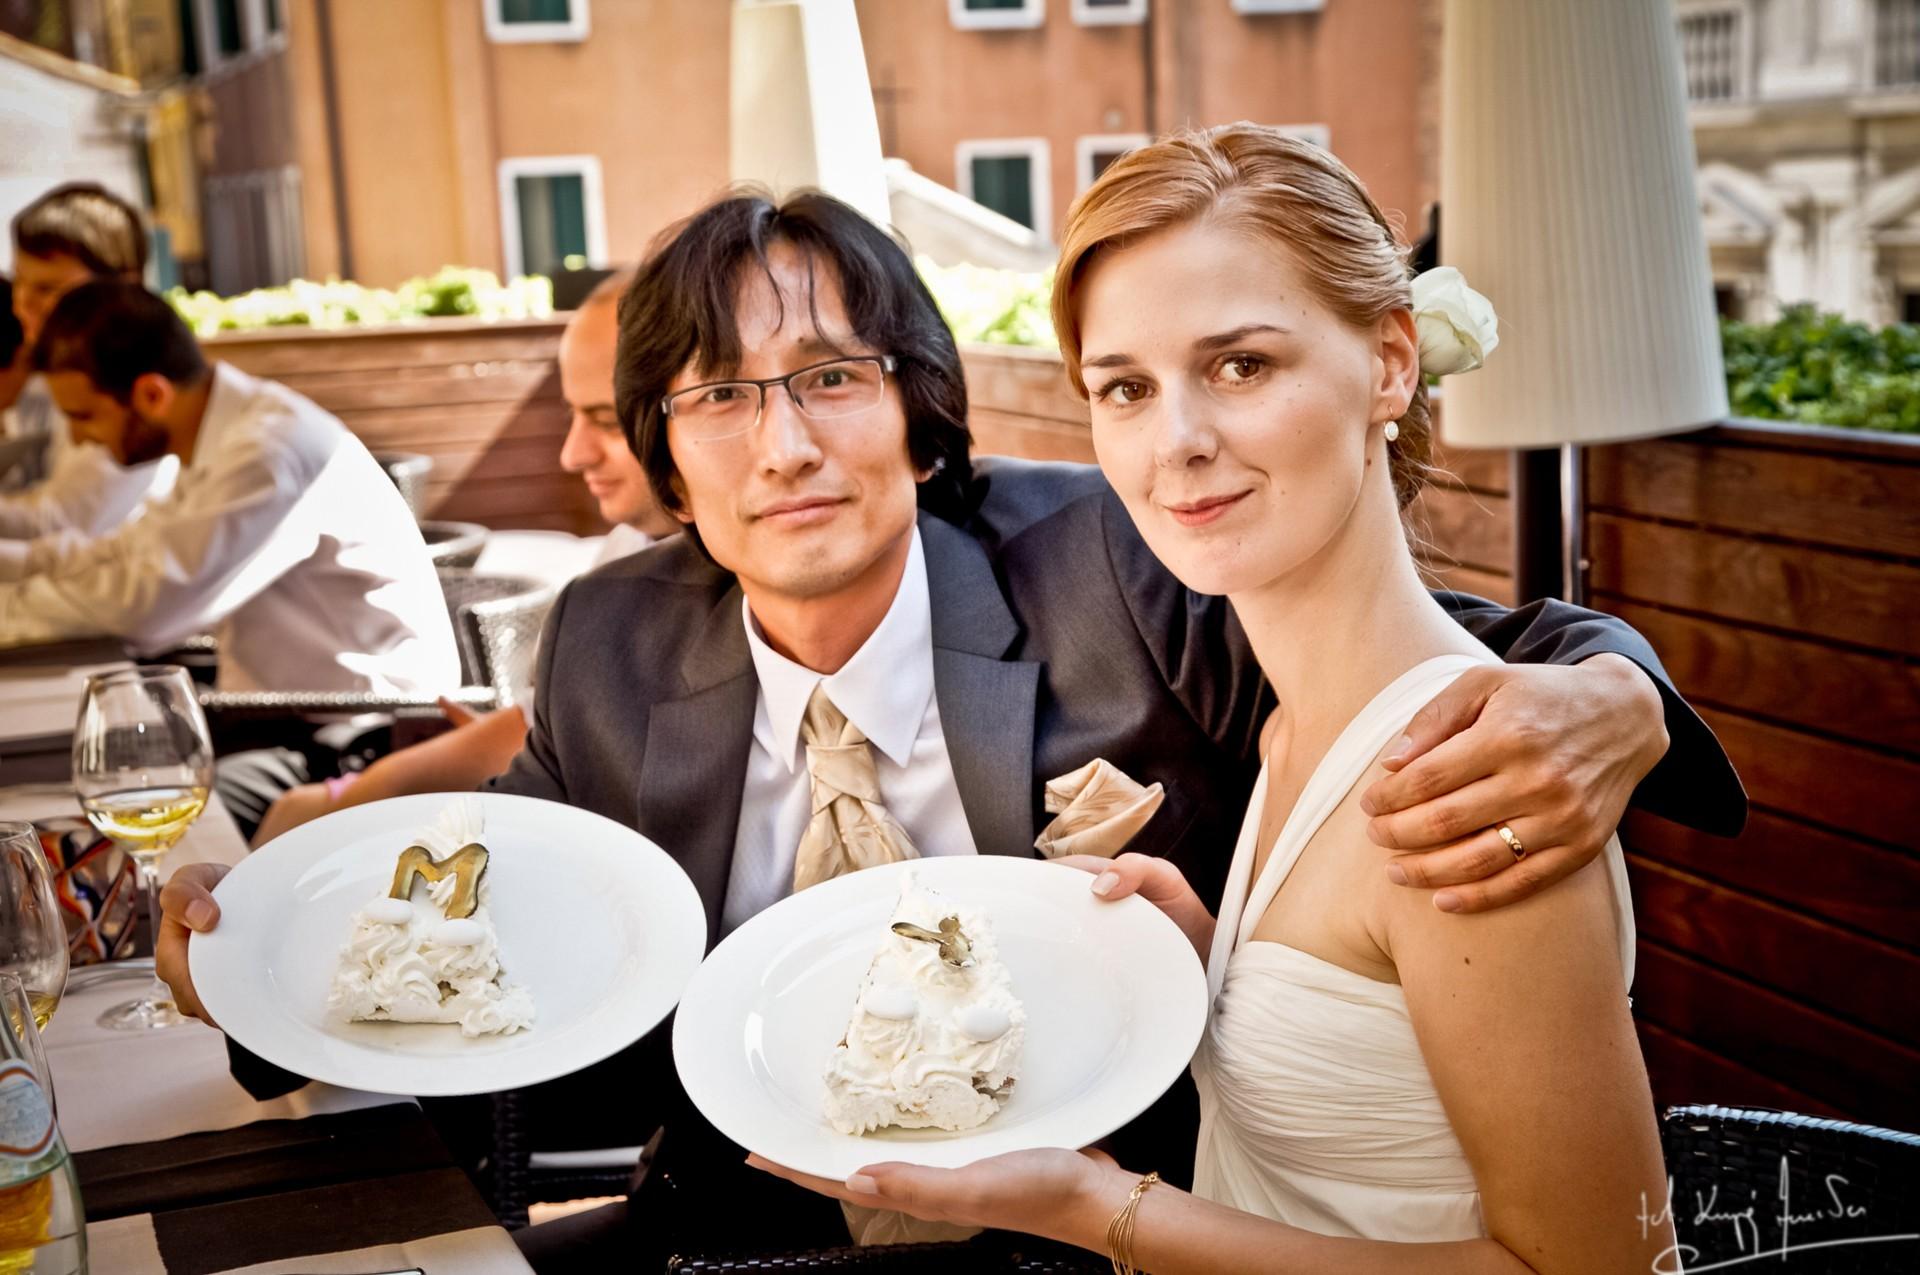 Ślub w wenecji 70 Manuela Luiza & Young Seon Song